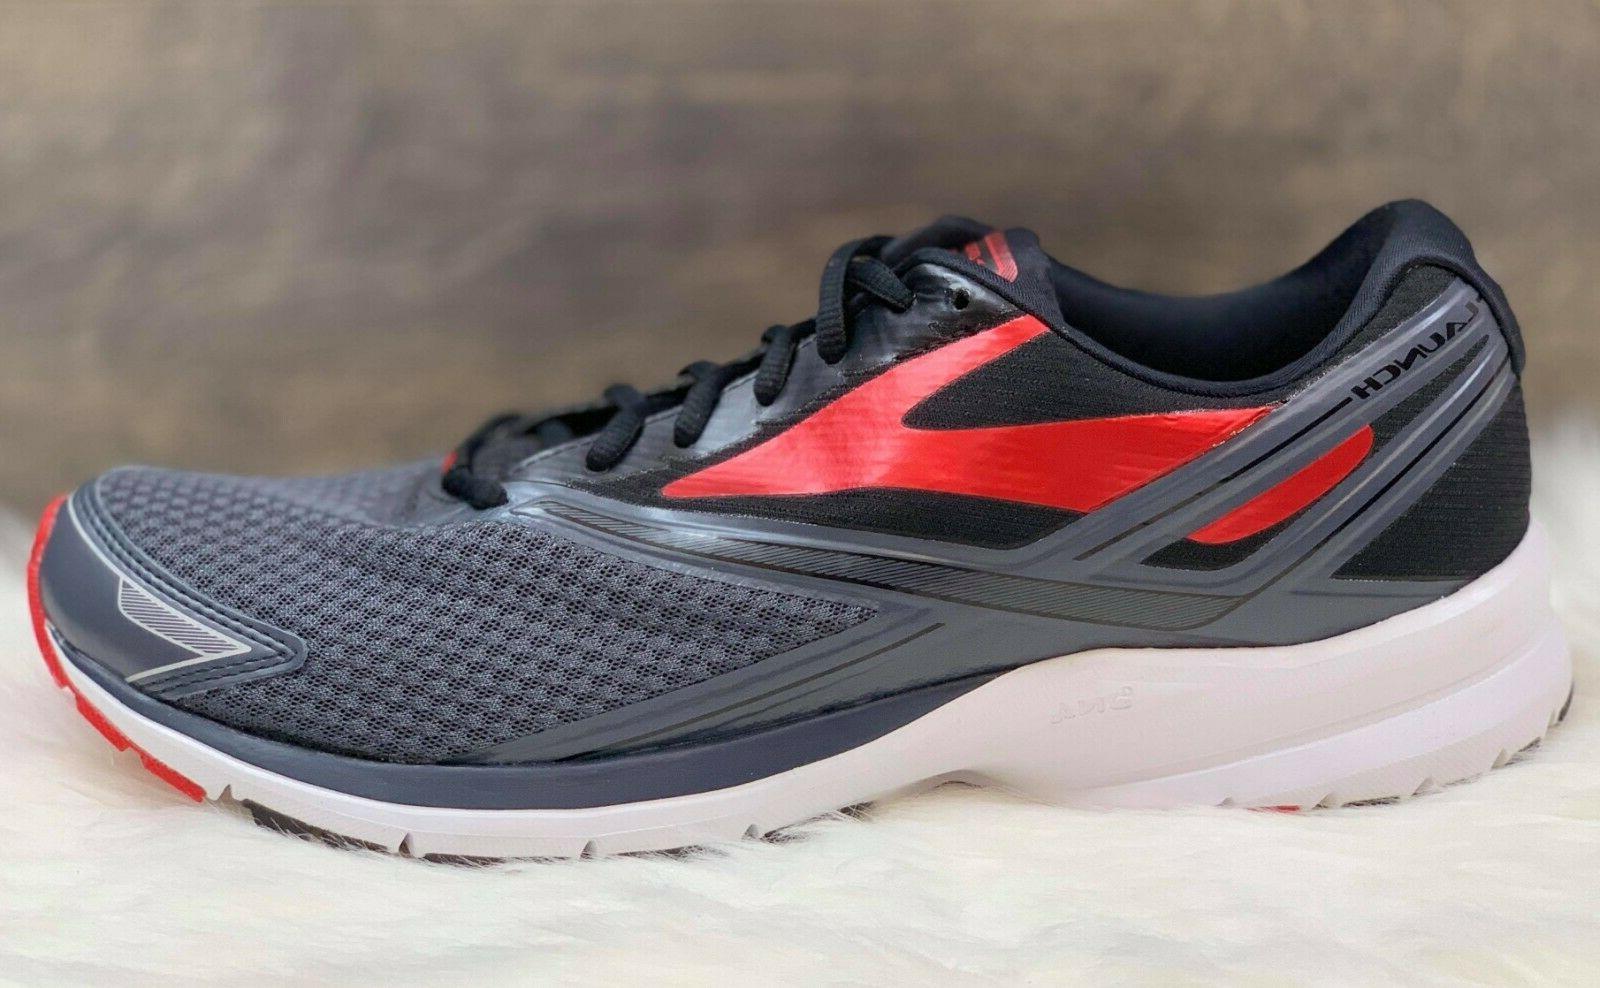 Brooks Men's 4 Running Shoes Grey/Black/Red Size 12